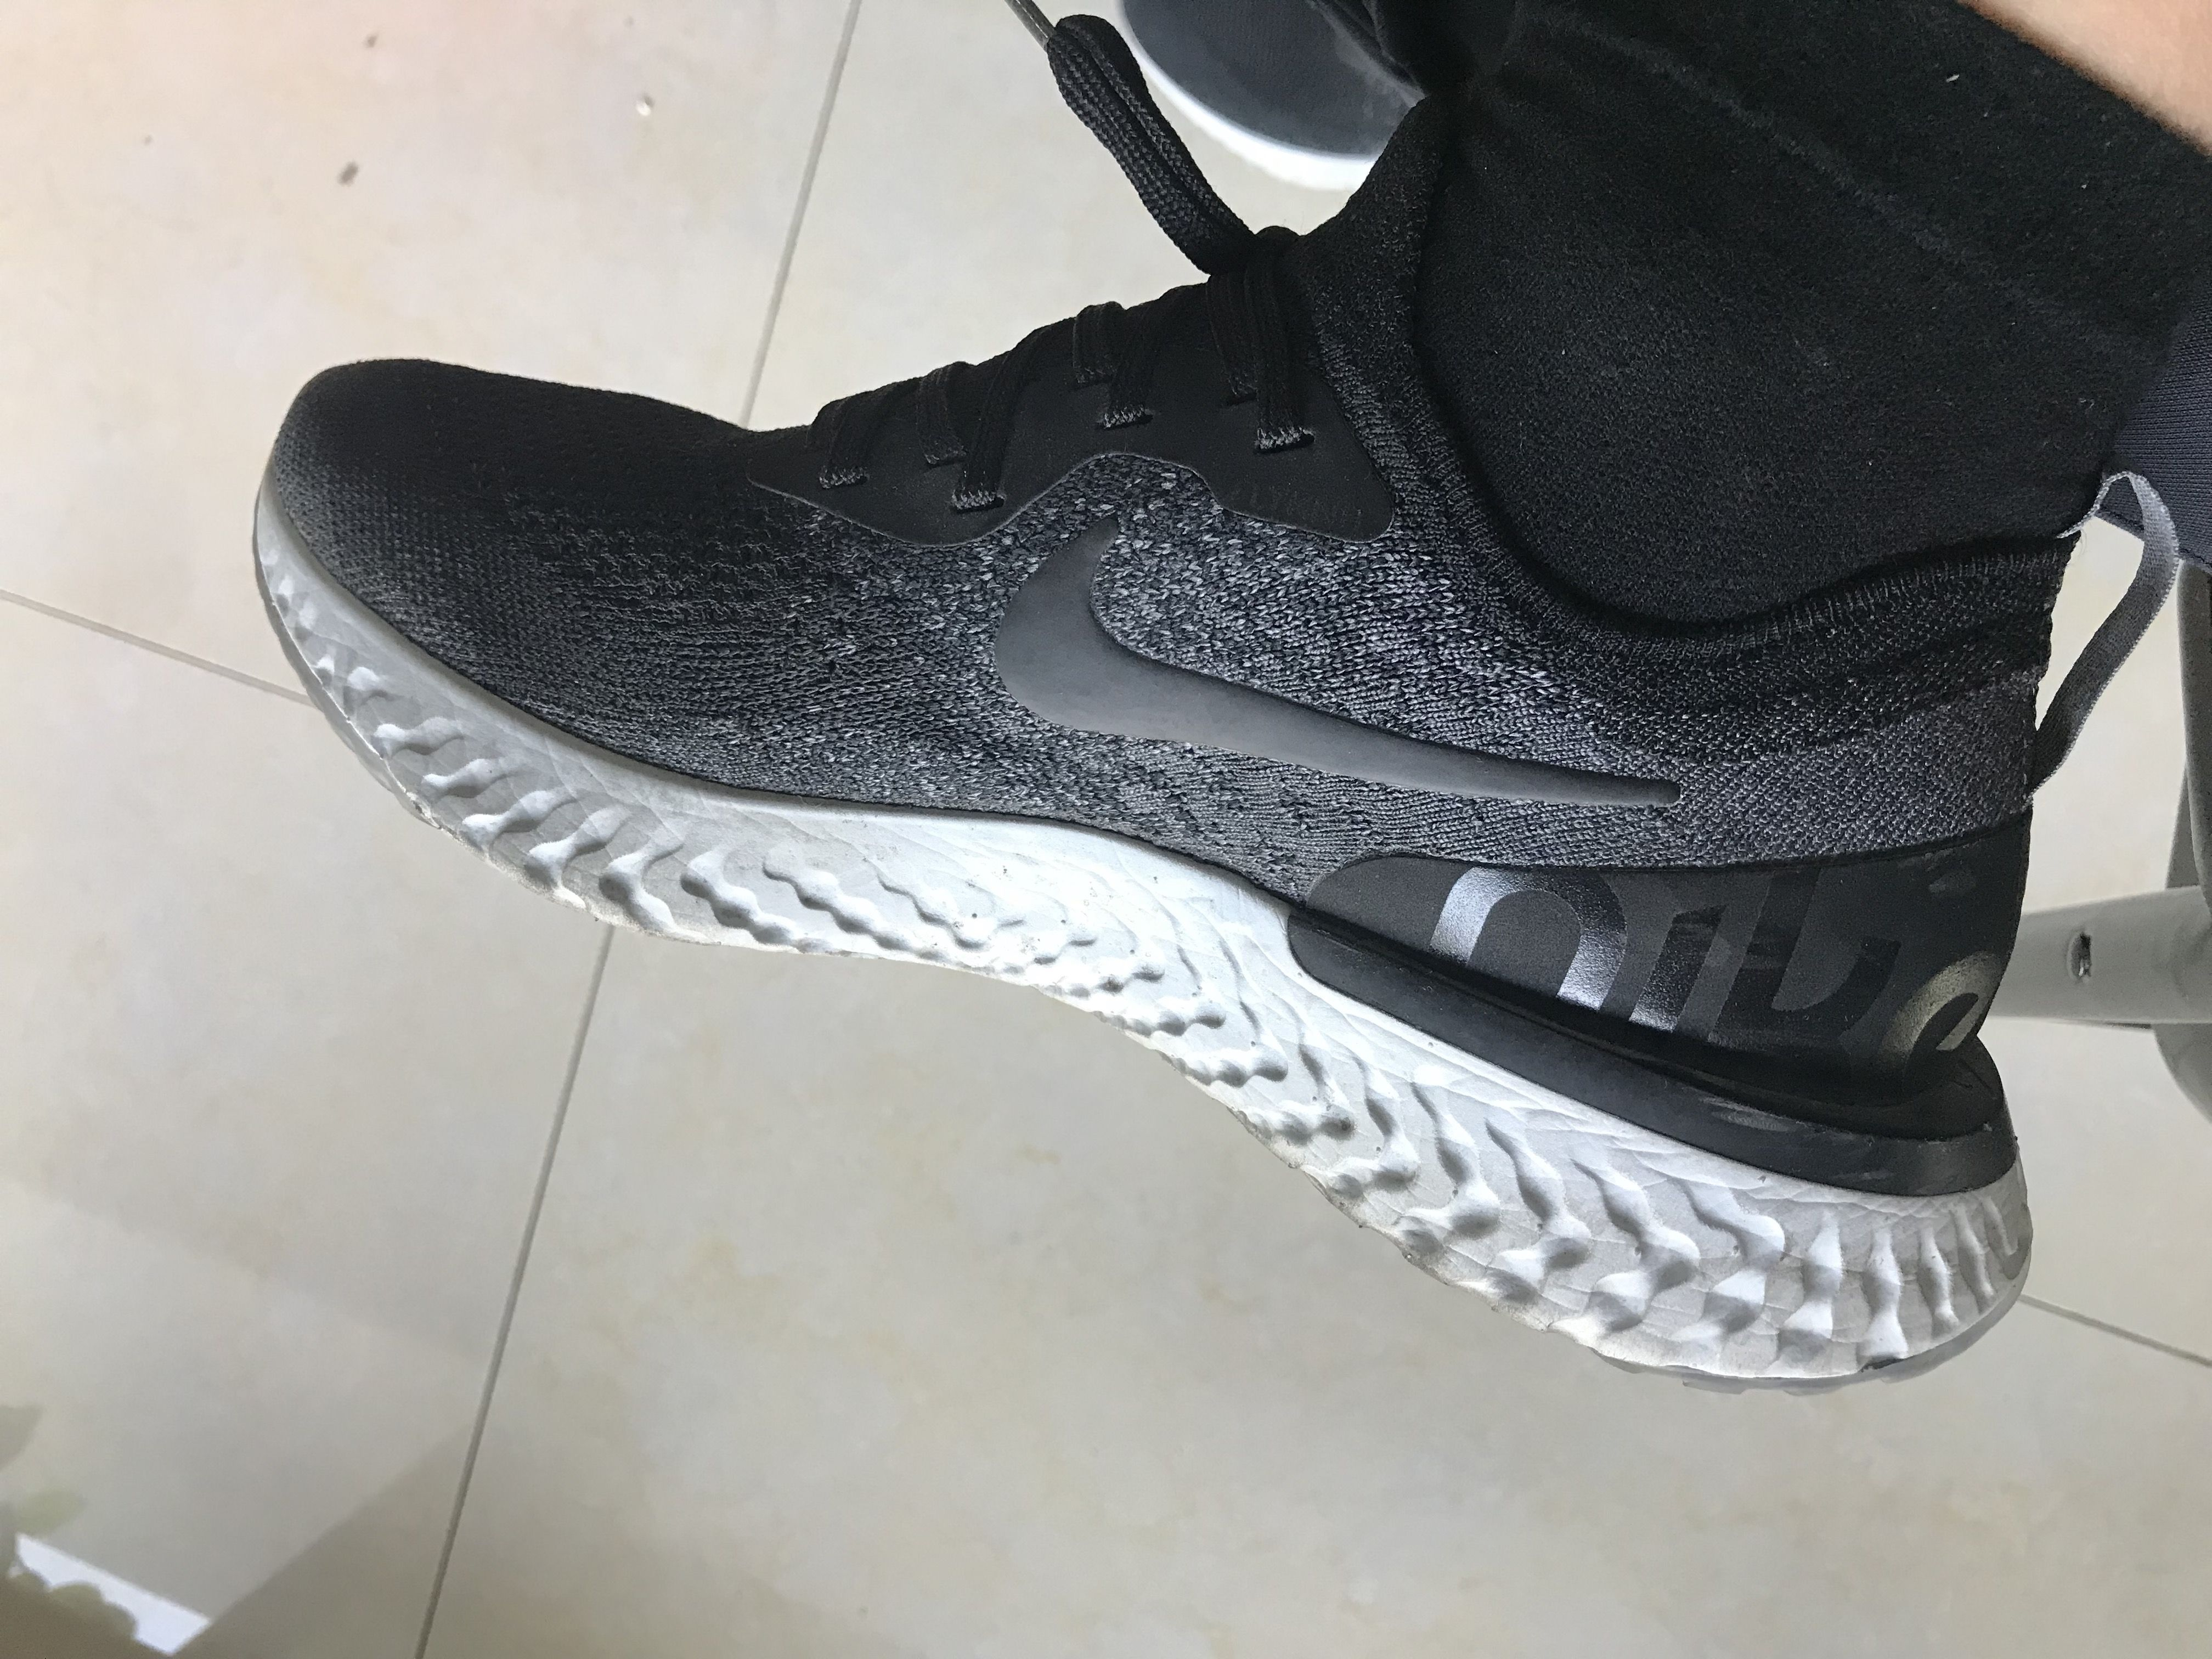 fb618c26e9d42 It is so similar to the shoes in the post of